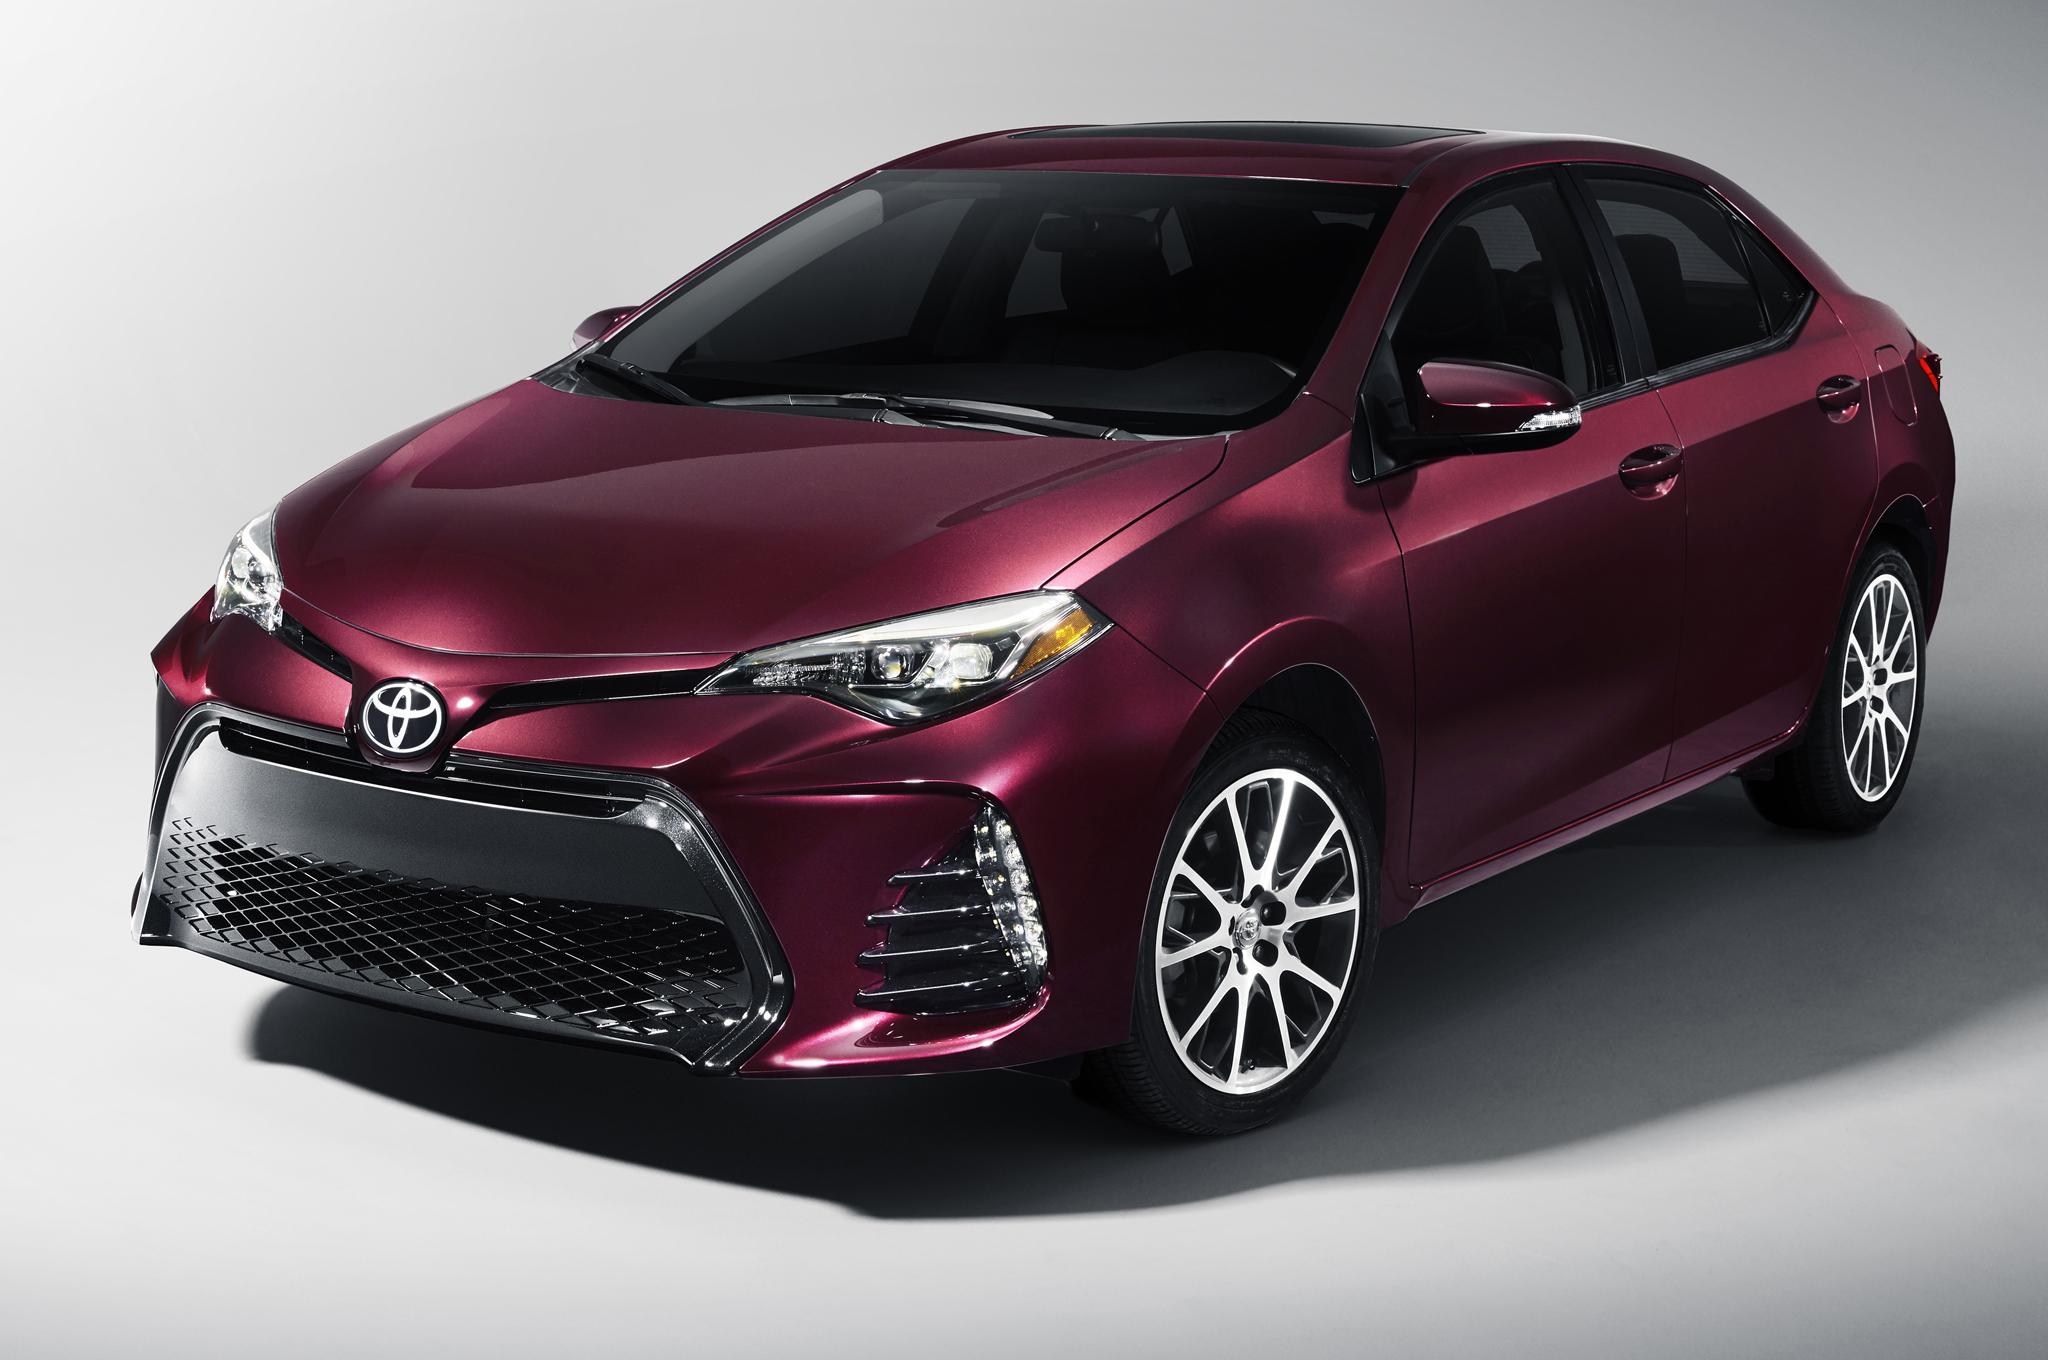 Toyota Corolla LE – new car under $25,000